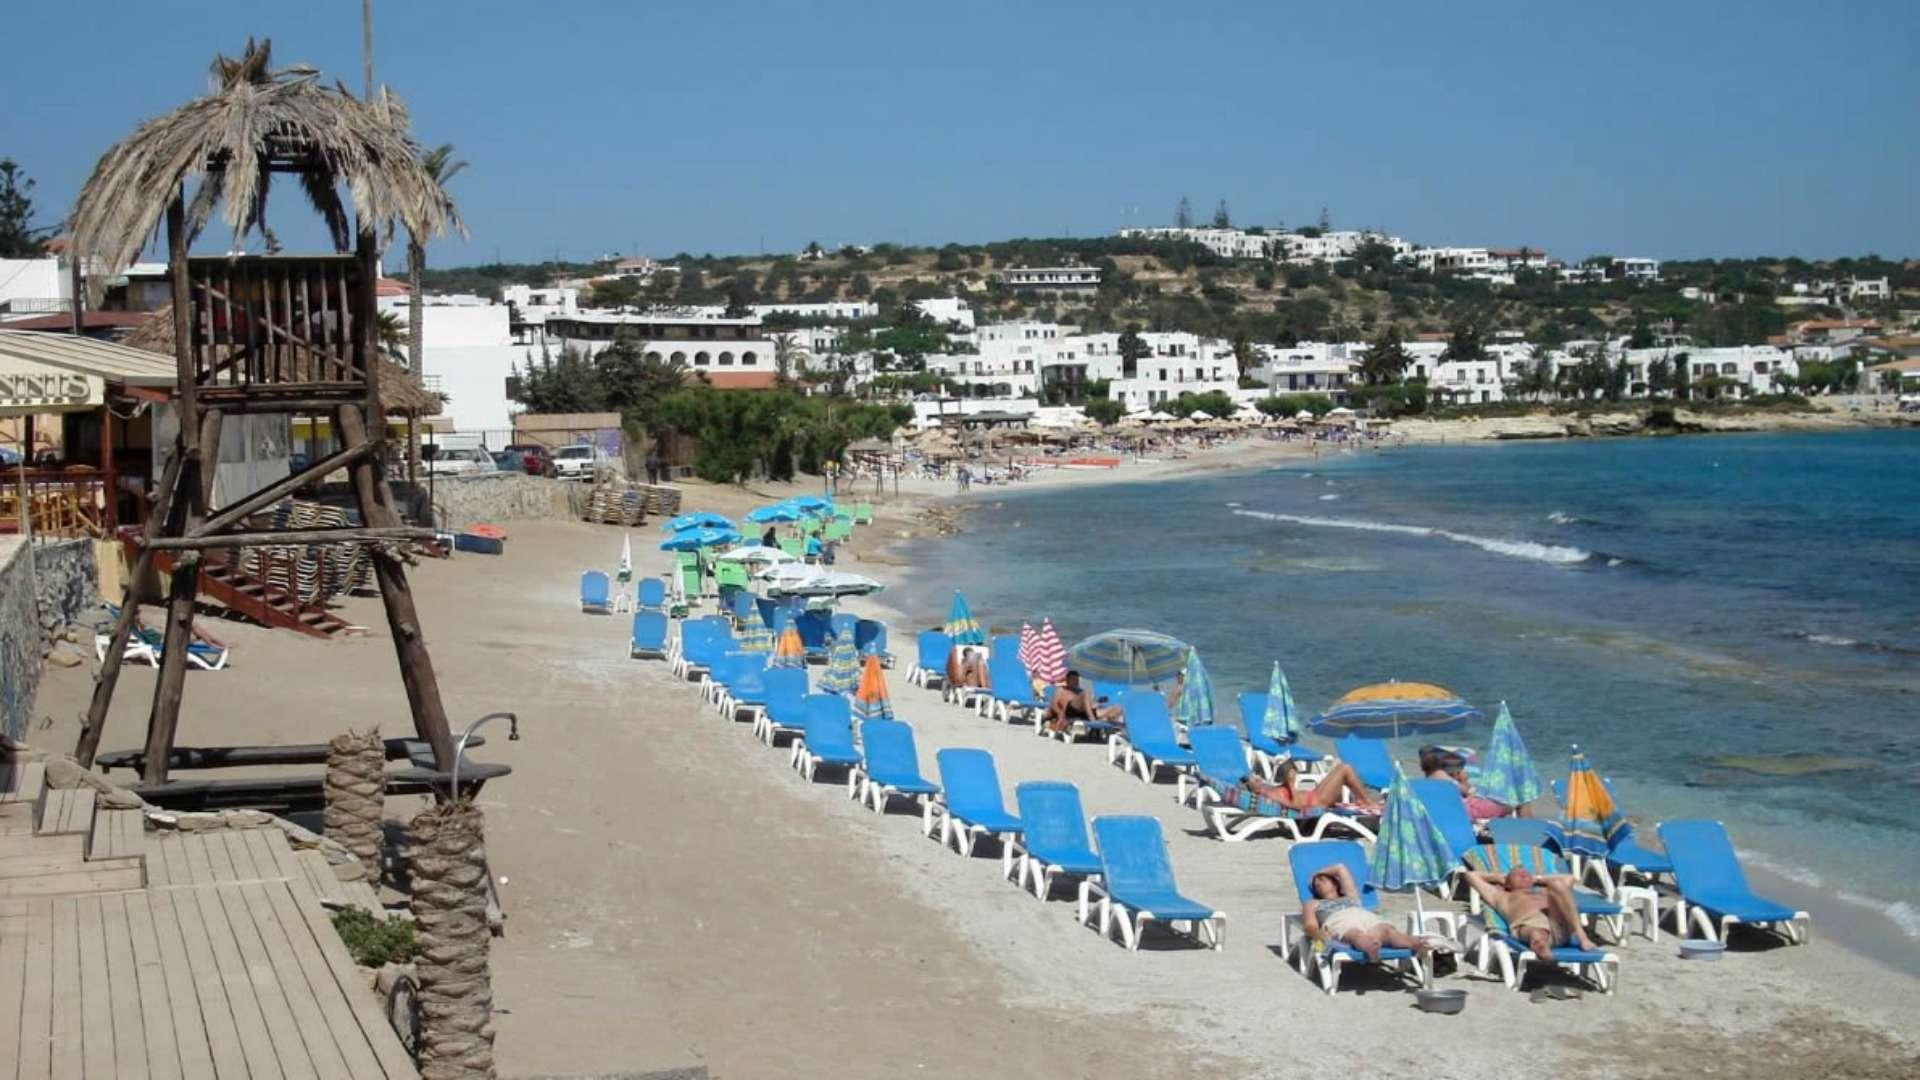 Star beach крит пляж фото